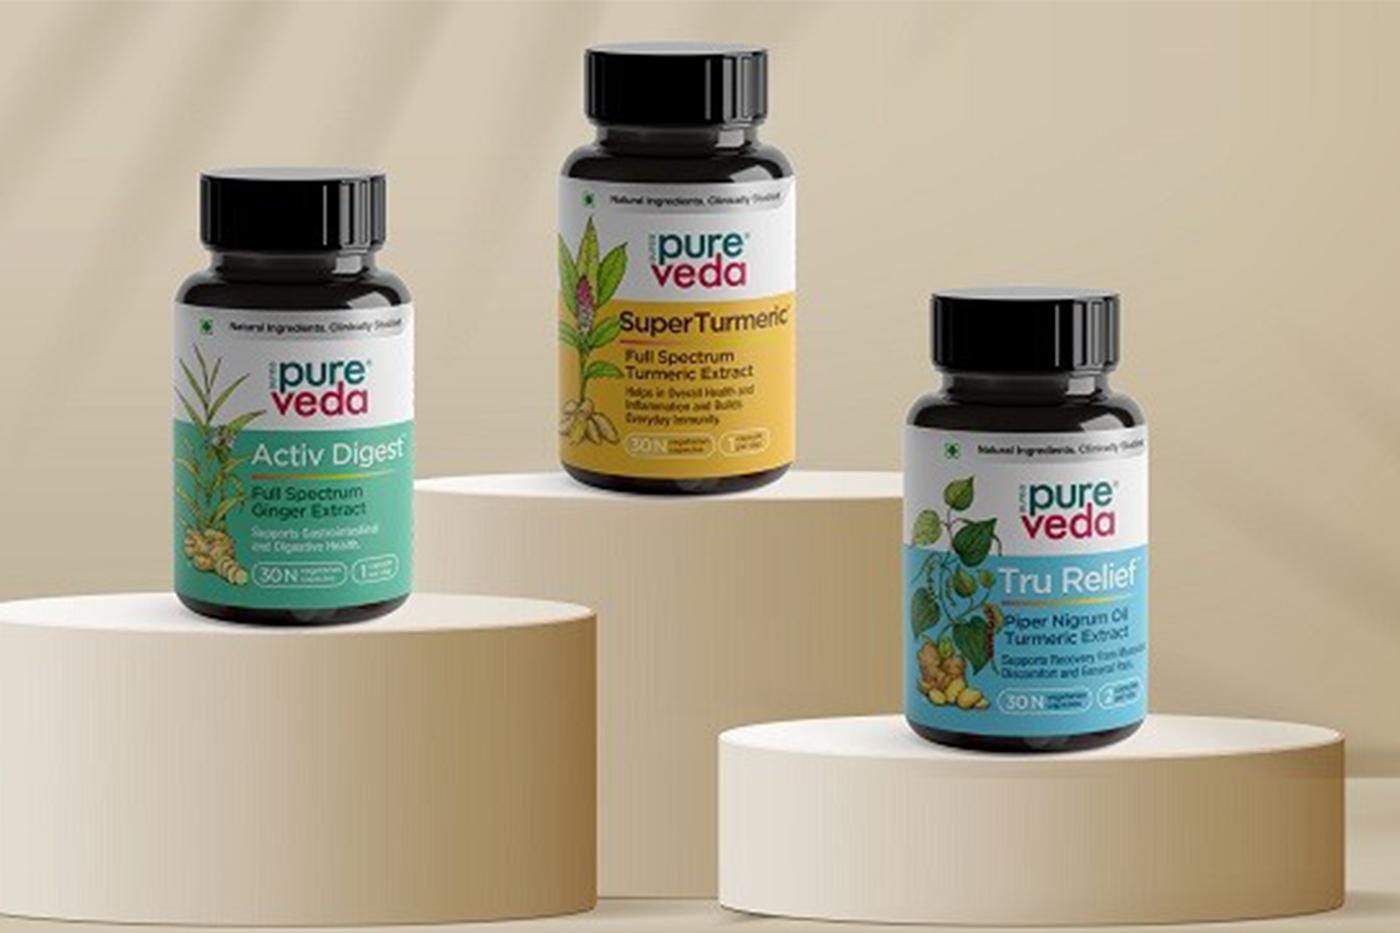 Aurea Biolabs unveils PureVeda for health-conscious people